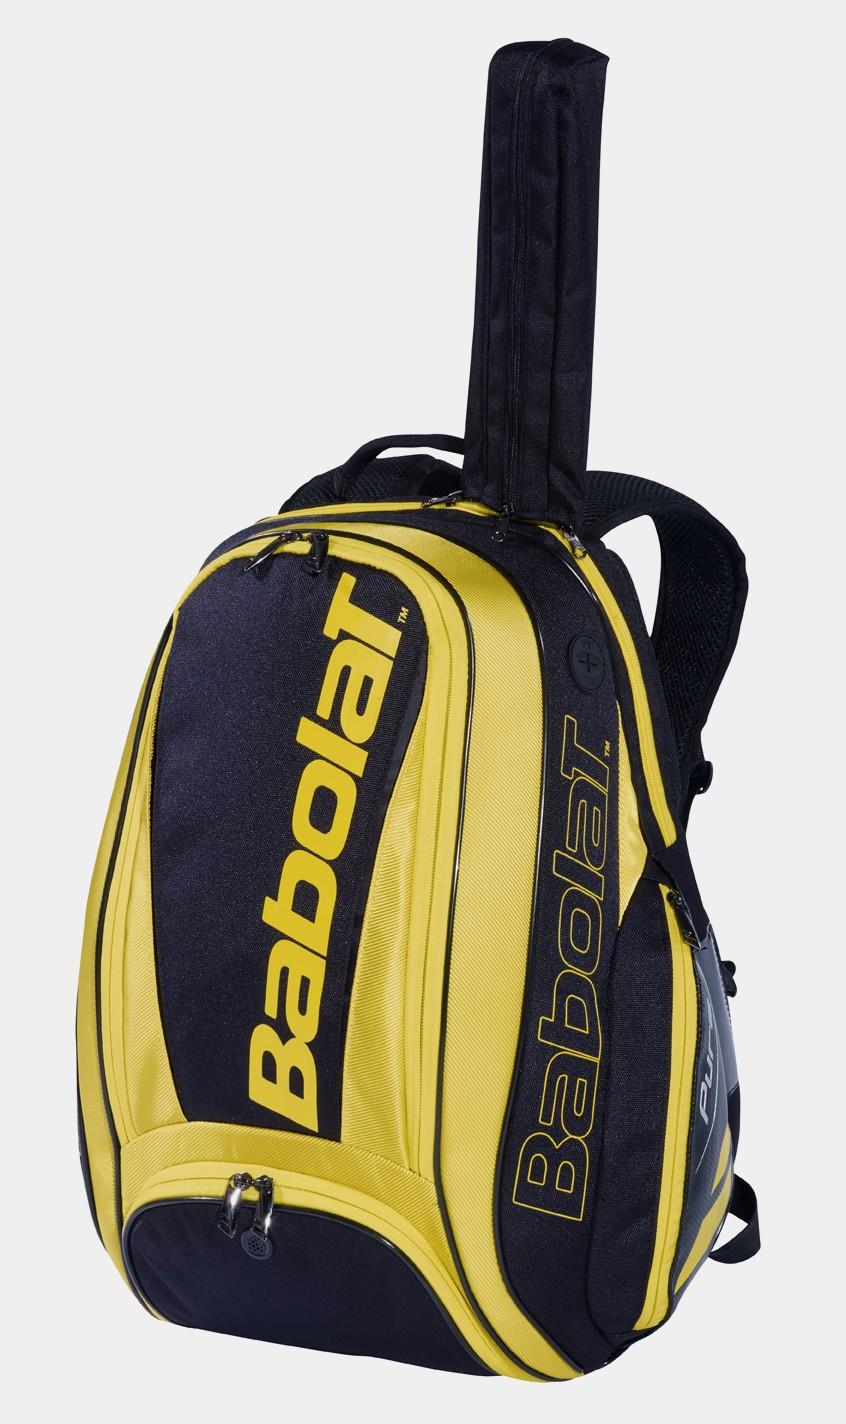 Plecak tenisowy Babolat Pure Aero 2019